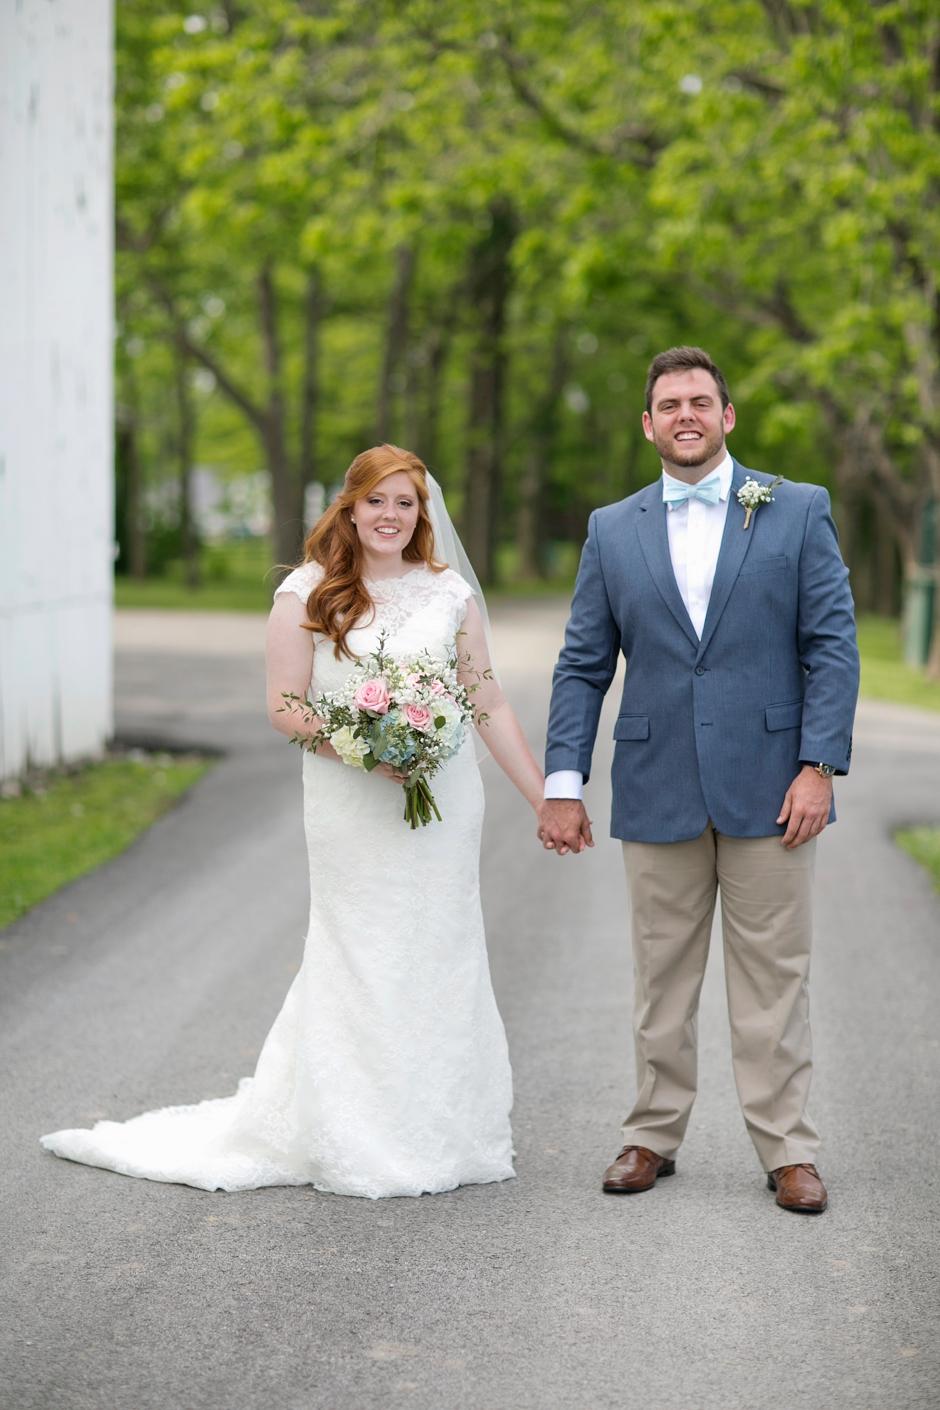 kentucky-spring-wedding-red-orchard-park-blush-580